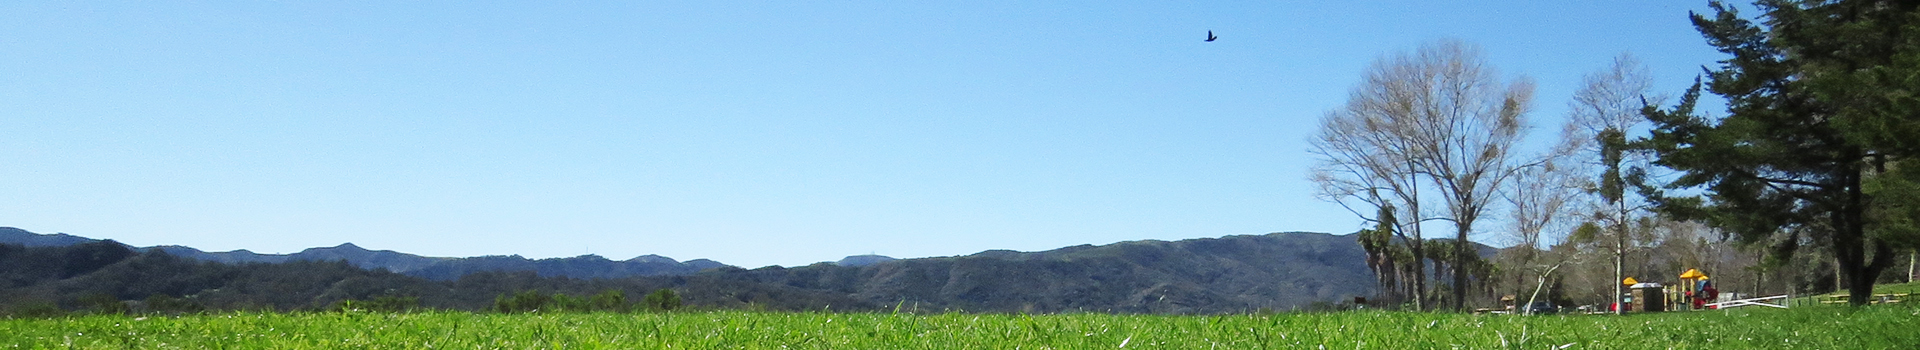 Camping at the Lake Casitas Recreation Area | Casitas